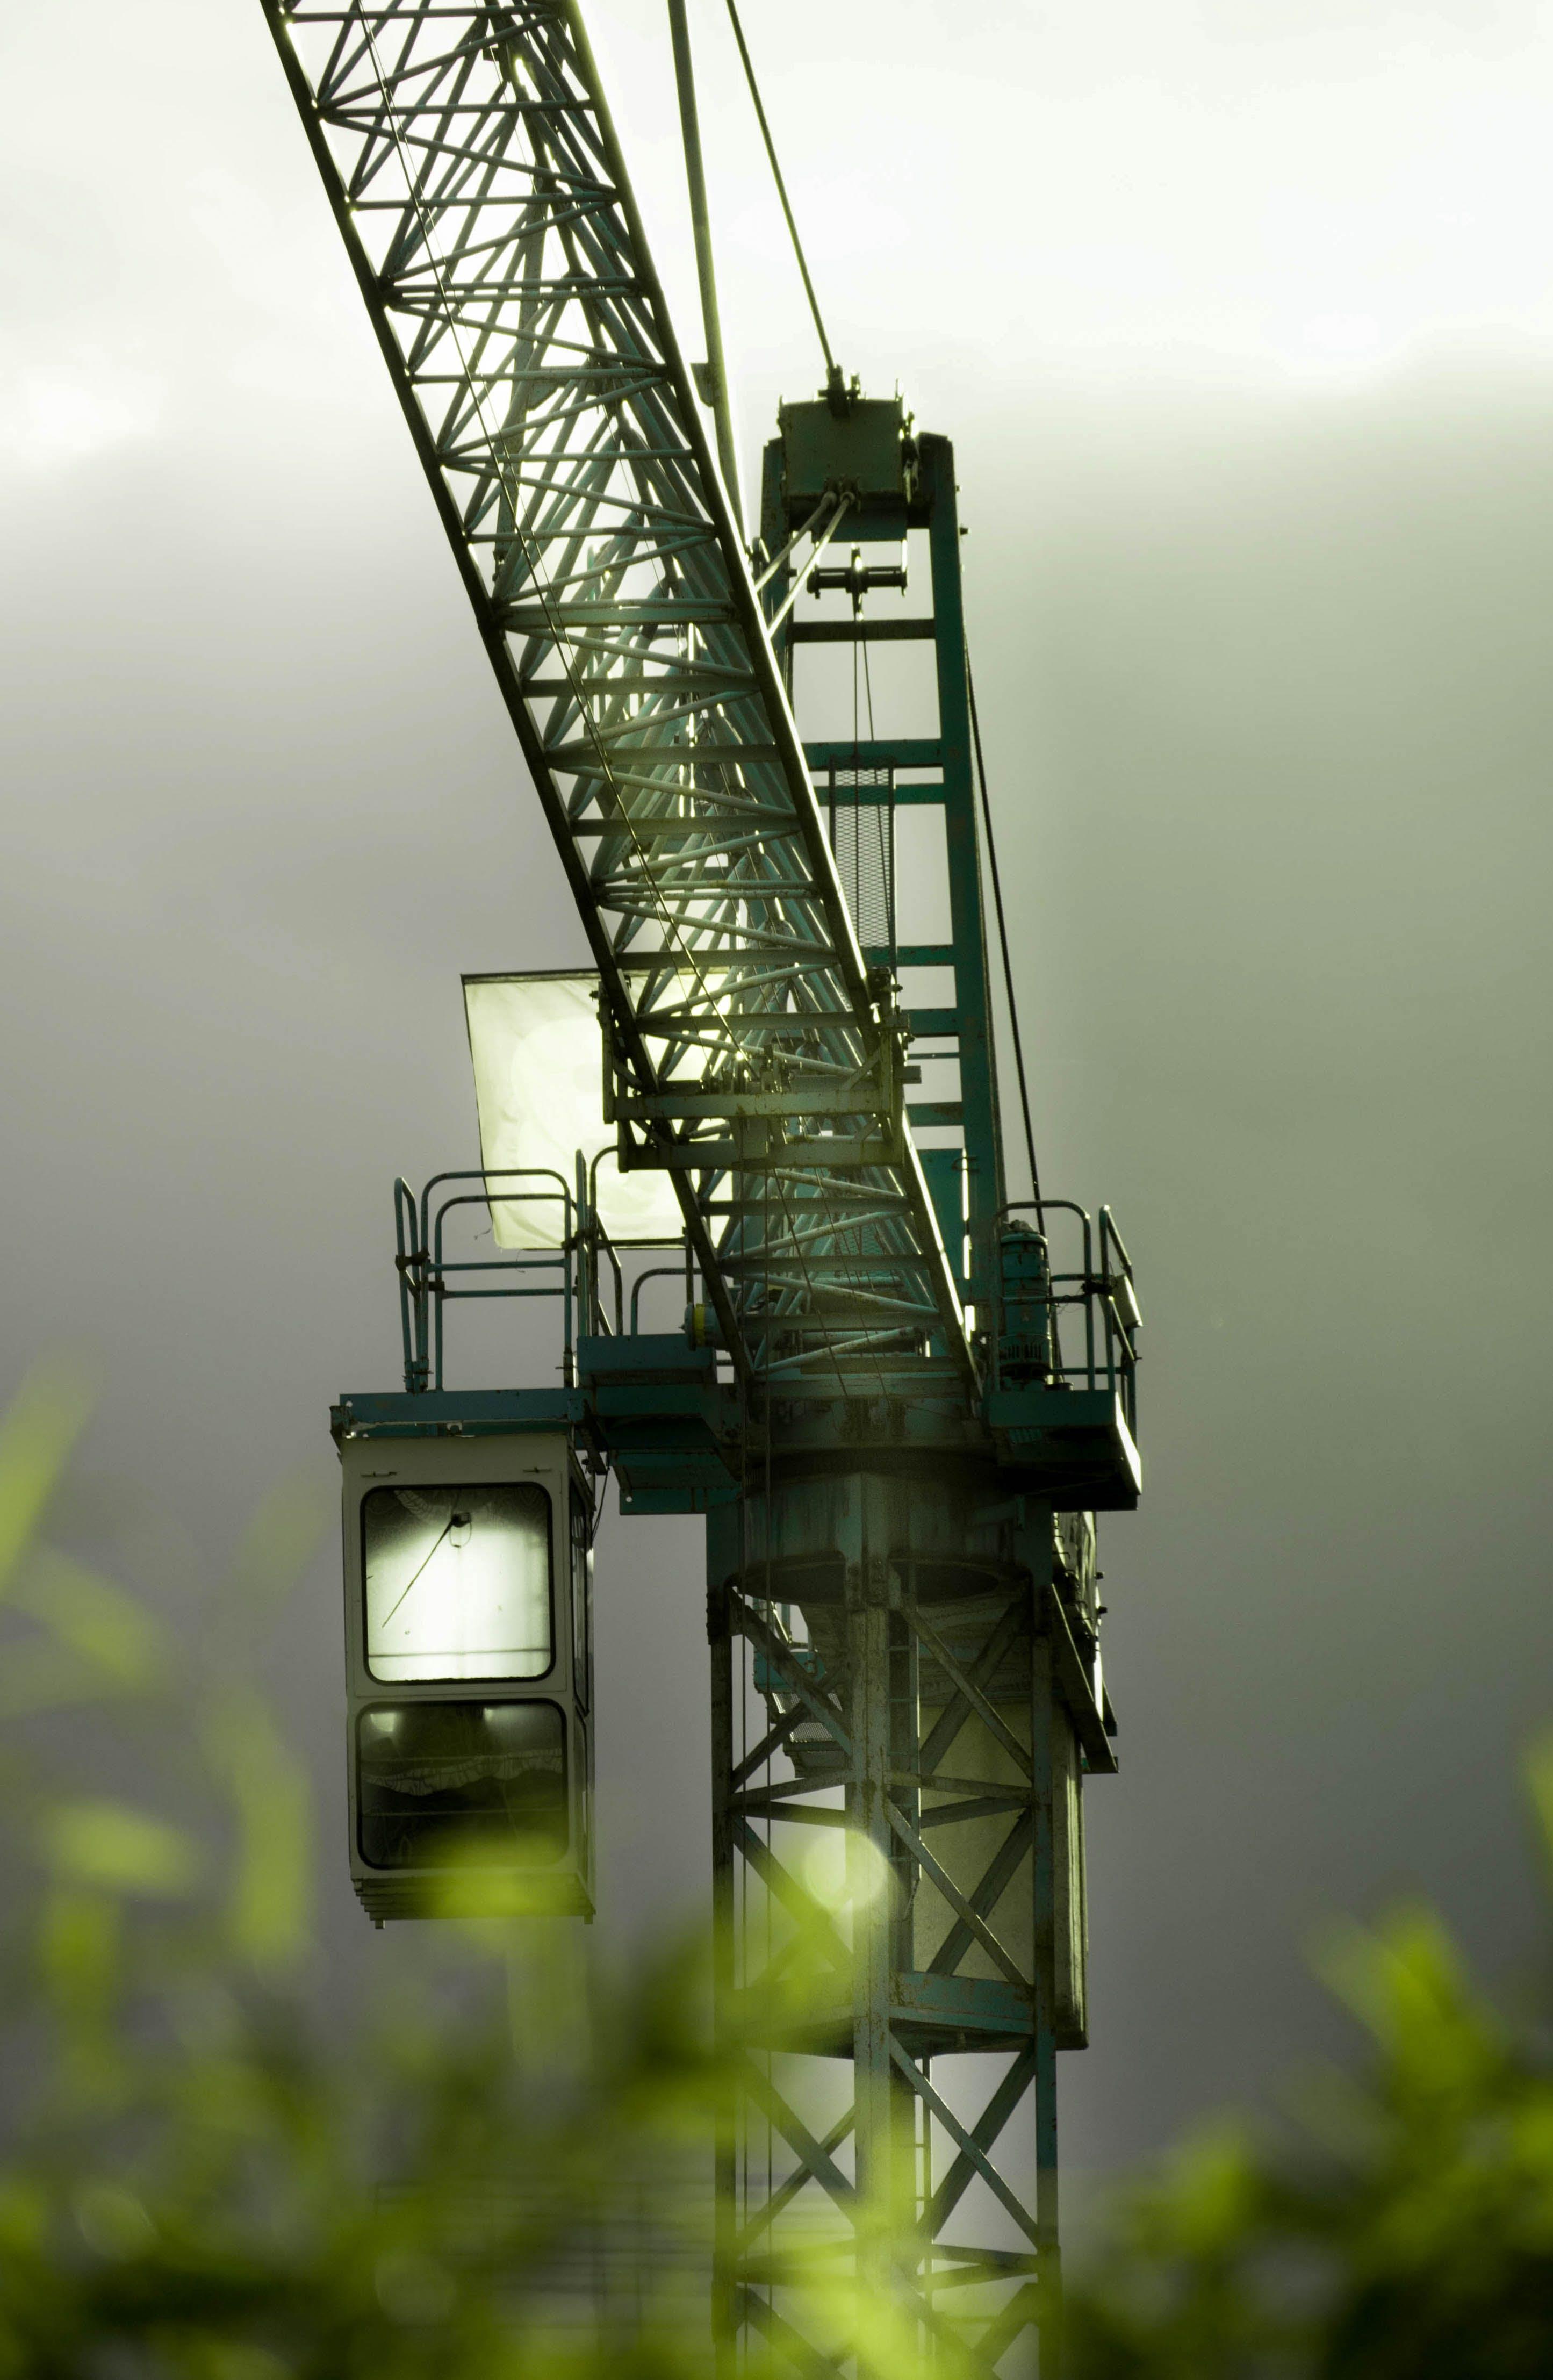 Tilt Lens Photography of Black Steel Crane